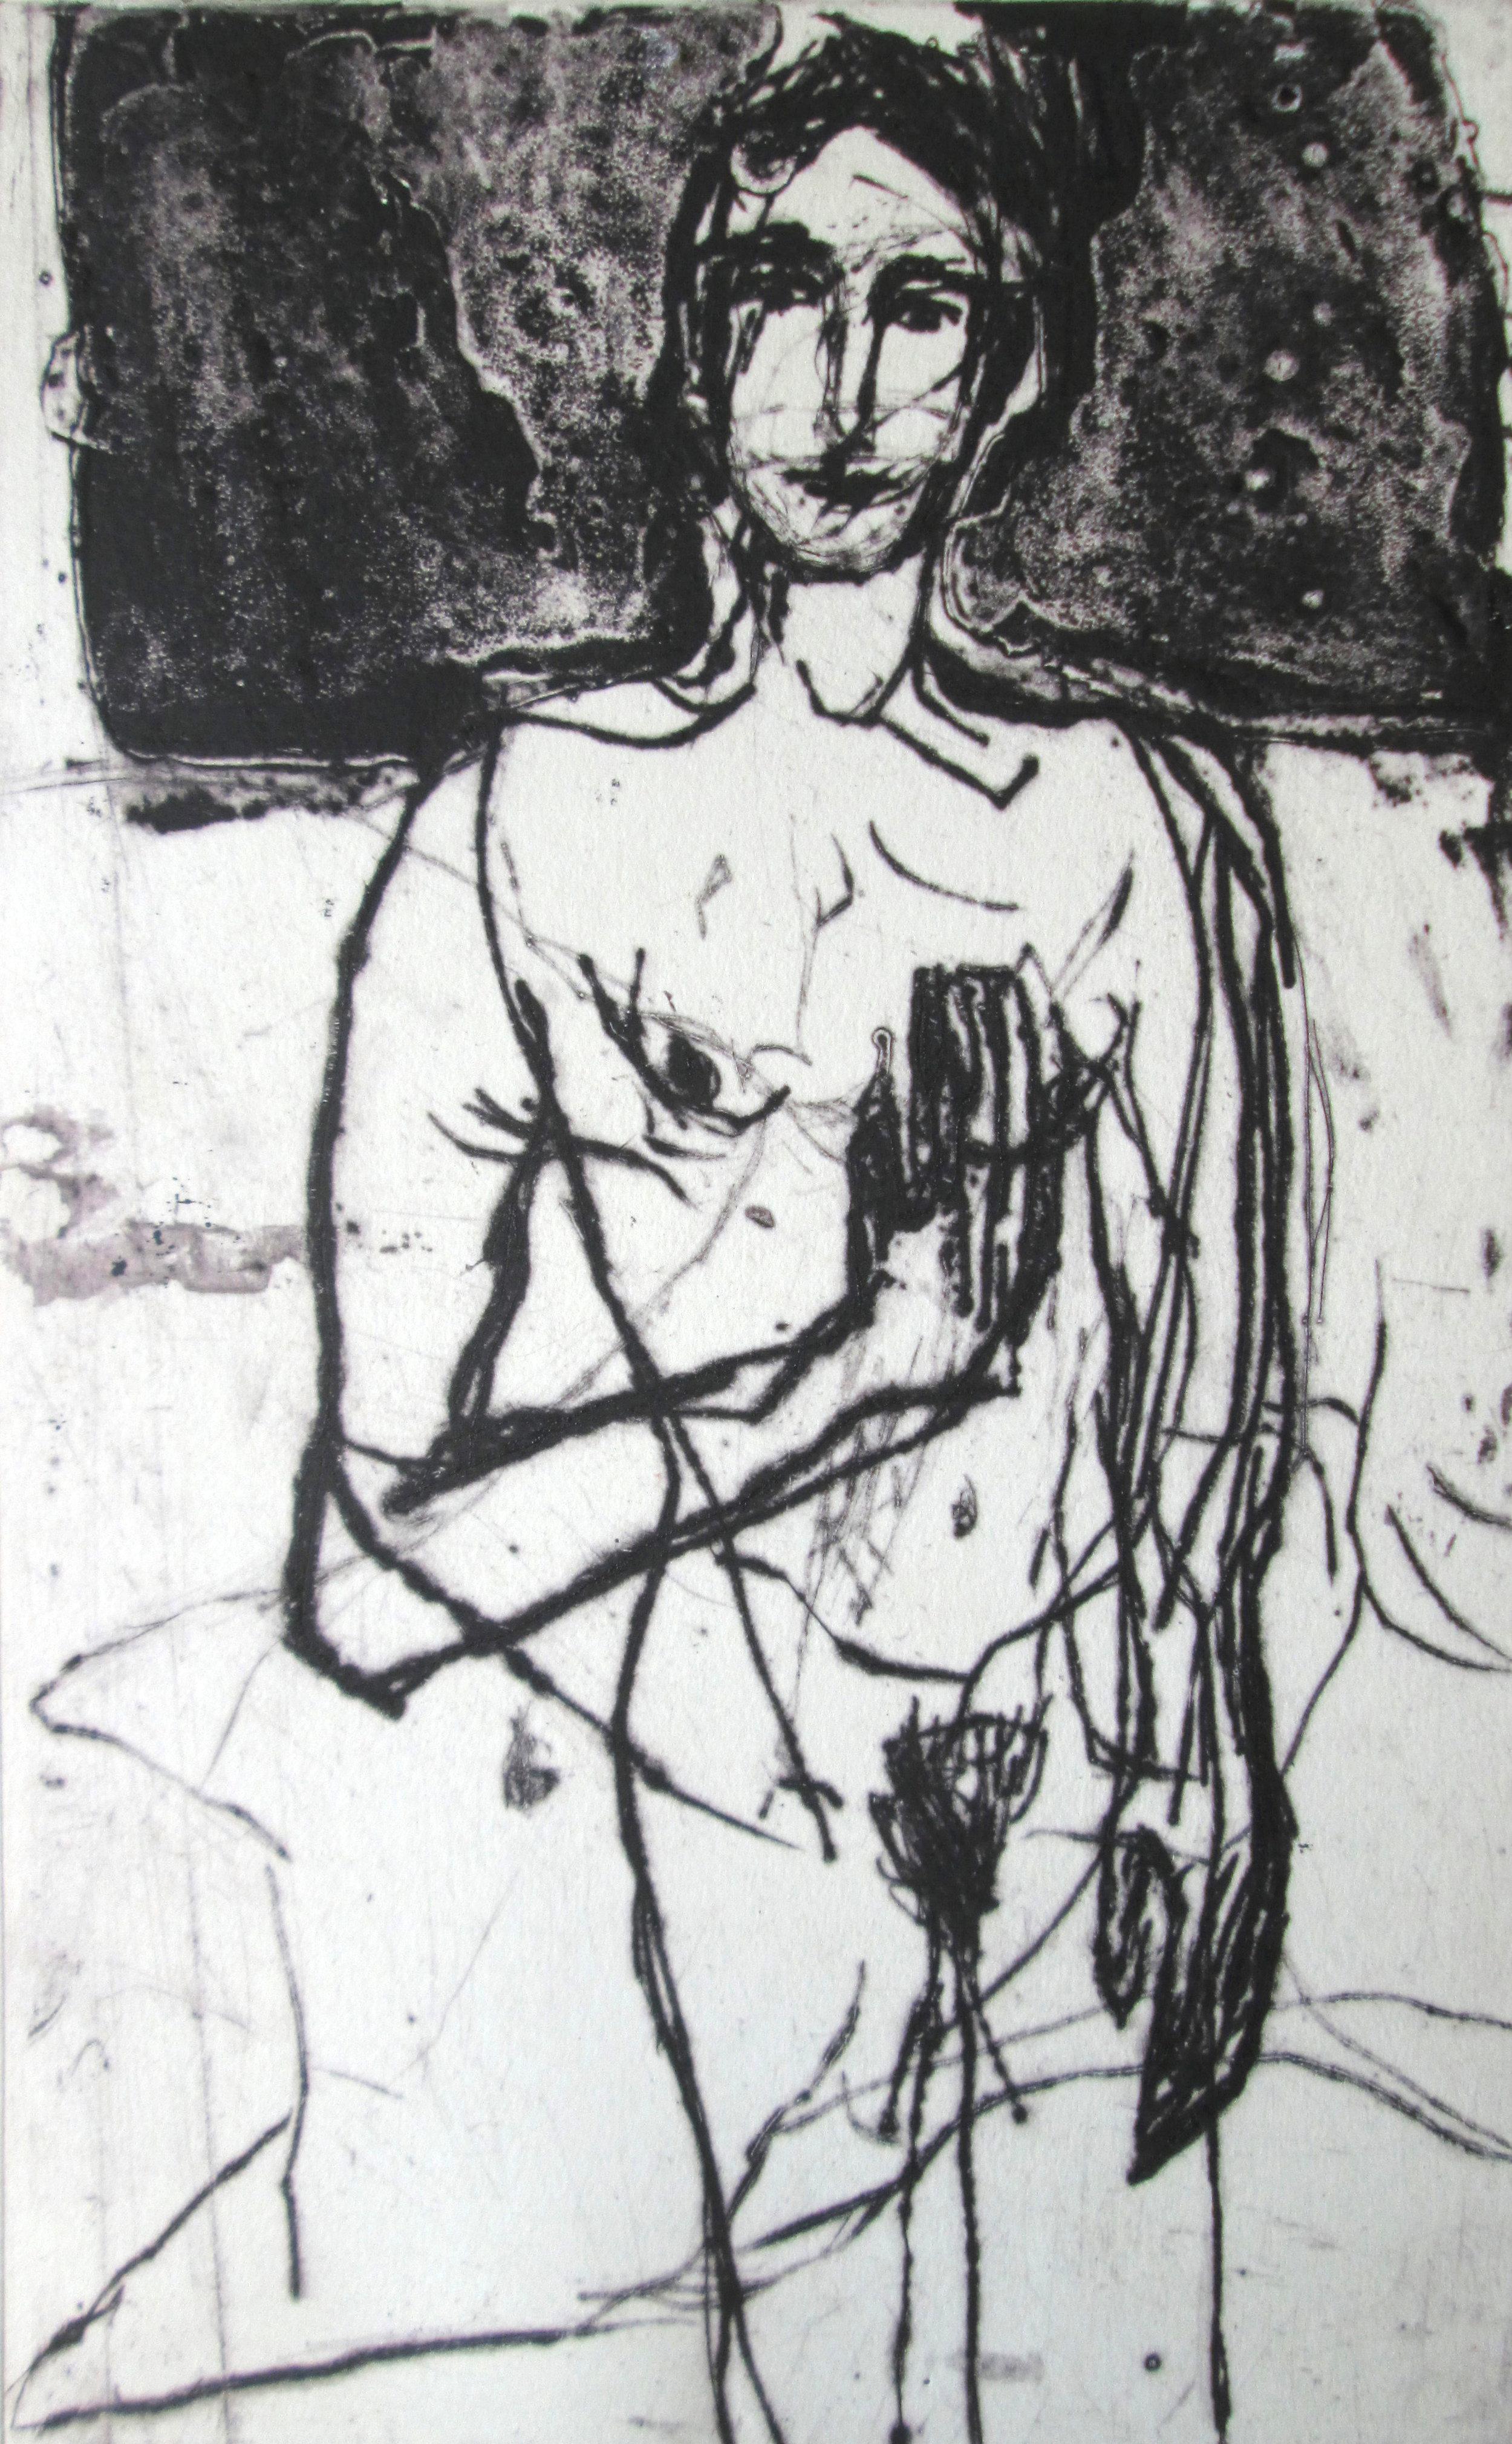 Title: The Midnight  Size: 55 x 39 cm  Medium: Dry point/ collograph  Price: £500